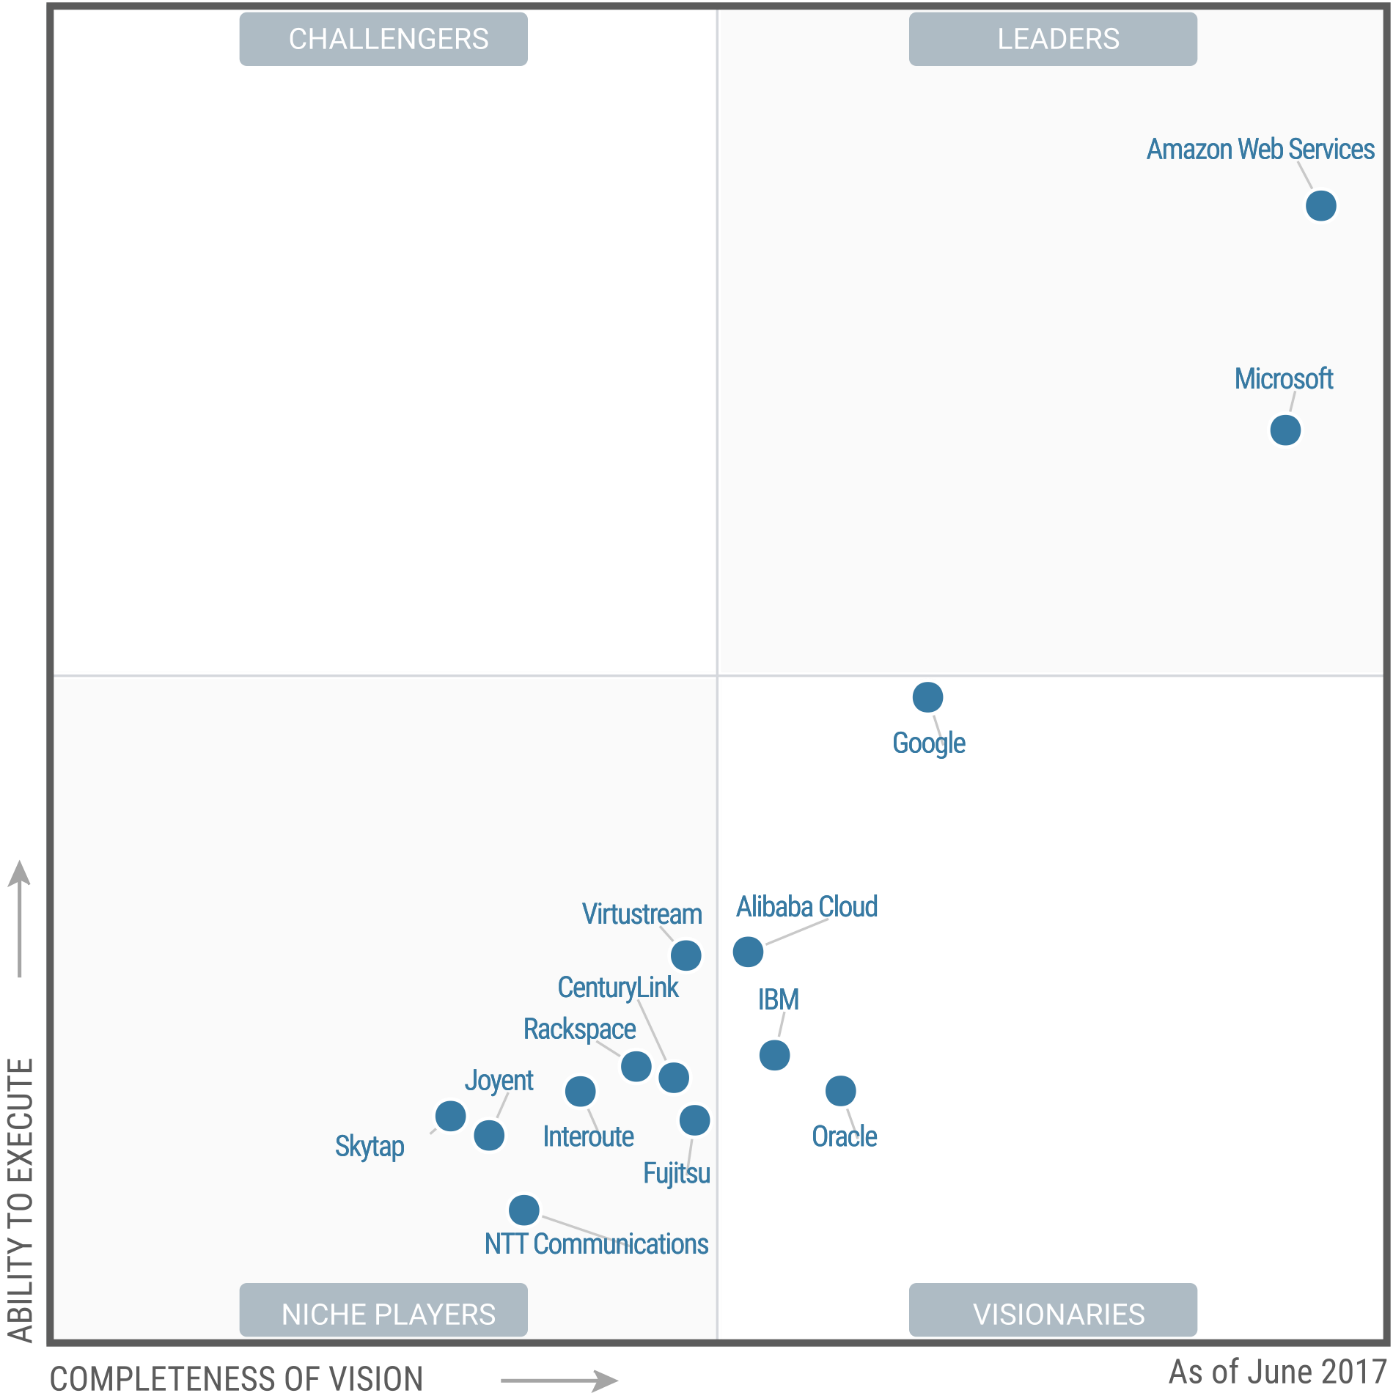 Gartner Magic Quadrant for Cloud Infrastructure as a Service (Worldwide) (2017, 2016, 2015, 2014, 2013, 2012…)